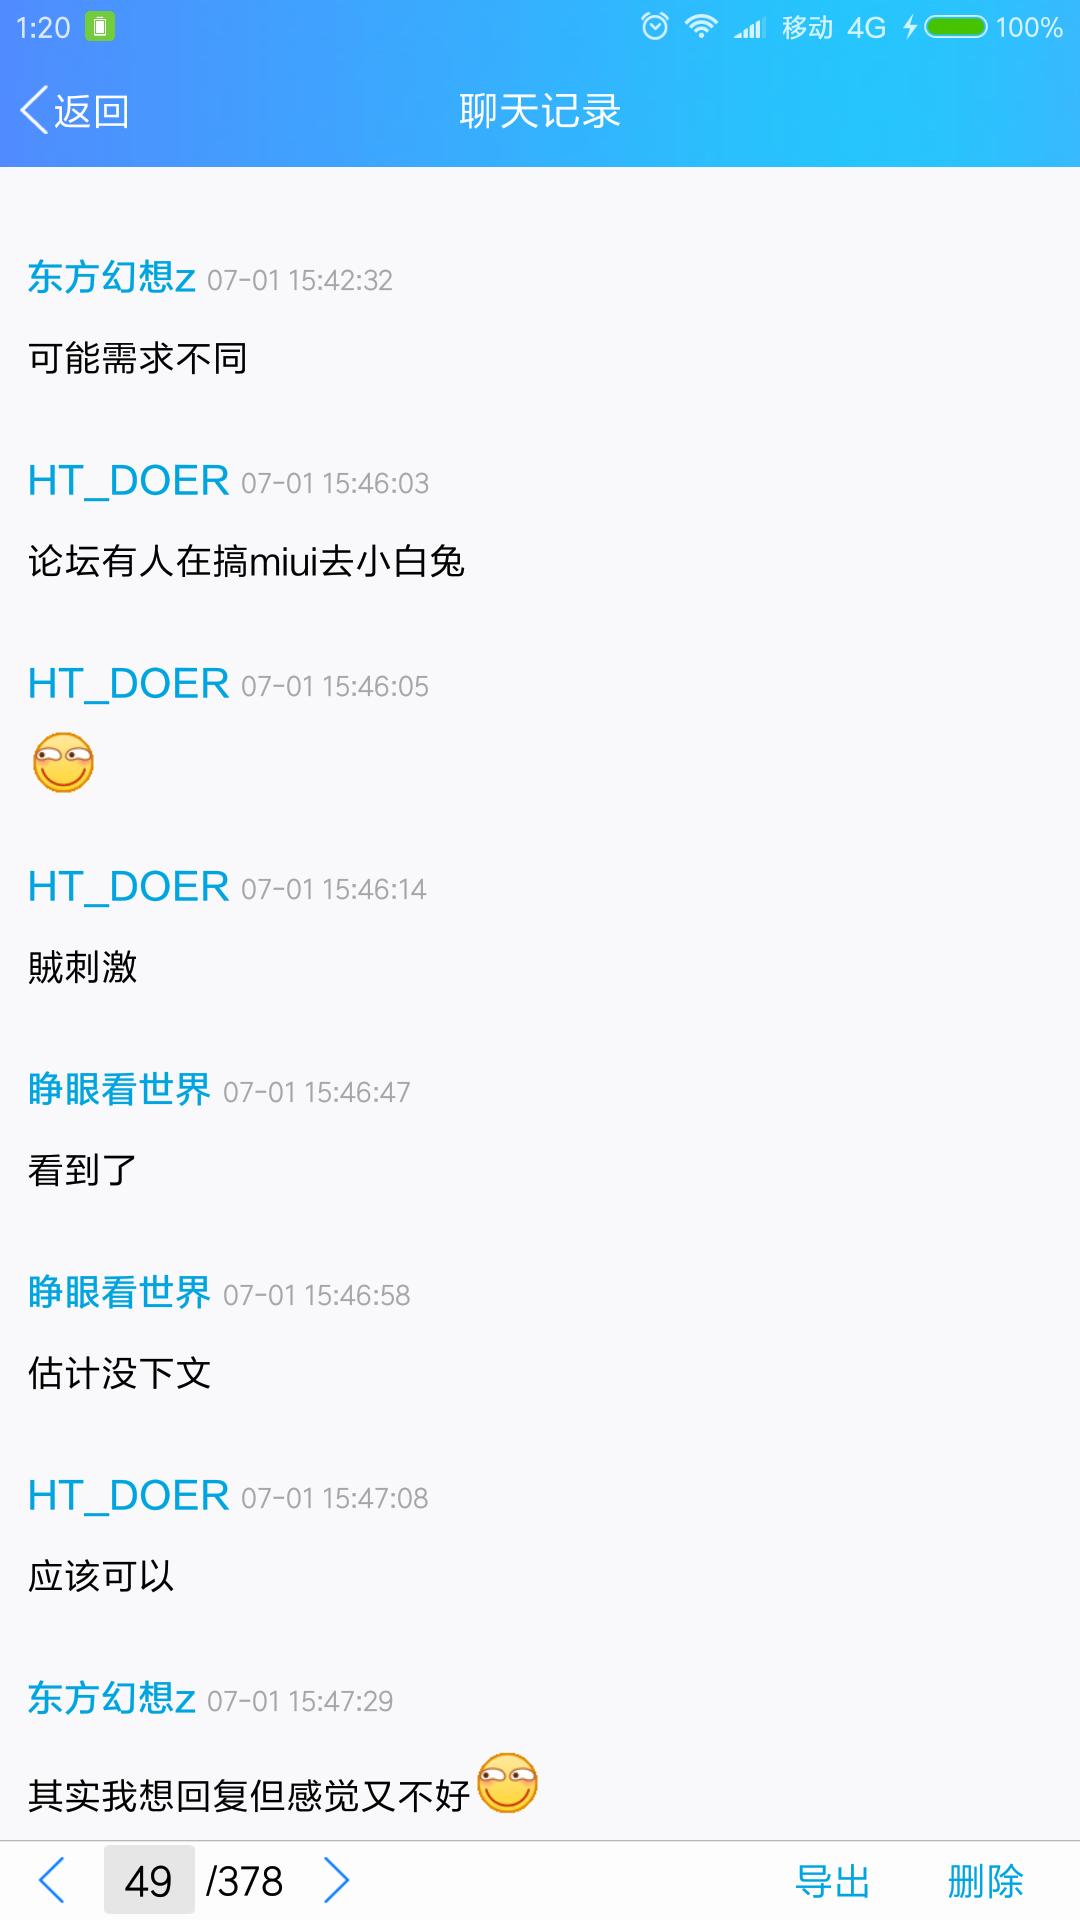 Screenshot_2017-07-09-01-20-38-021_com.tencent.mobileqq.png